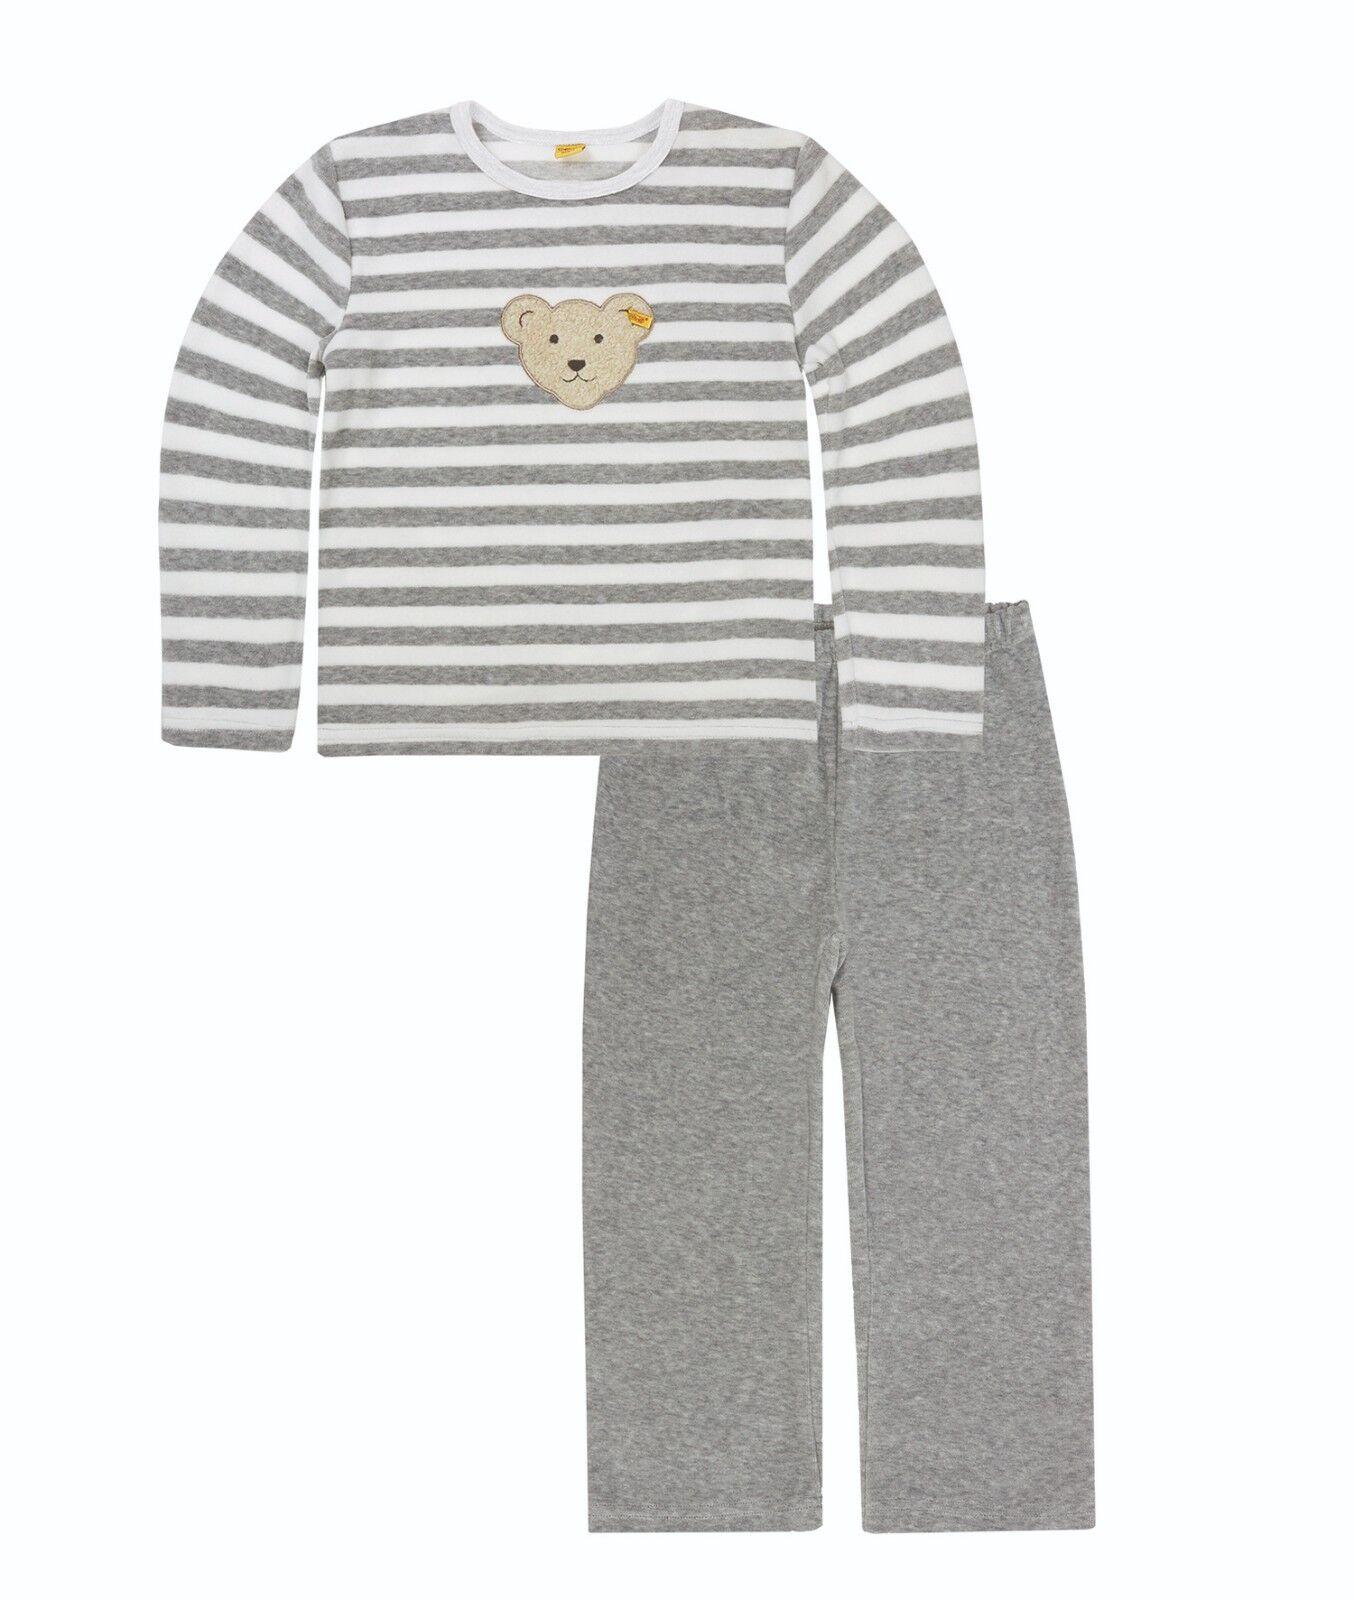 Steiff Schlafanzug Pyjama Gr.  92  110  oder 122  Neu 2018 - 2019 - 30 %